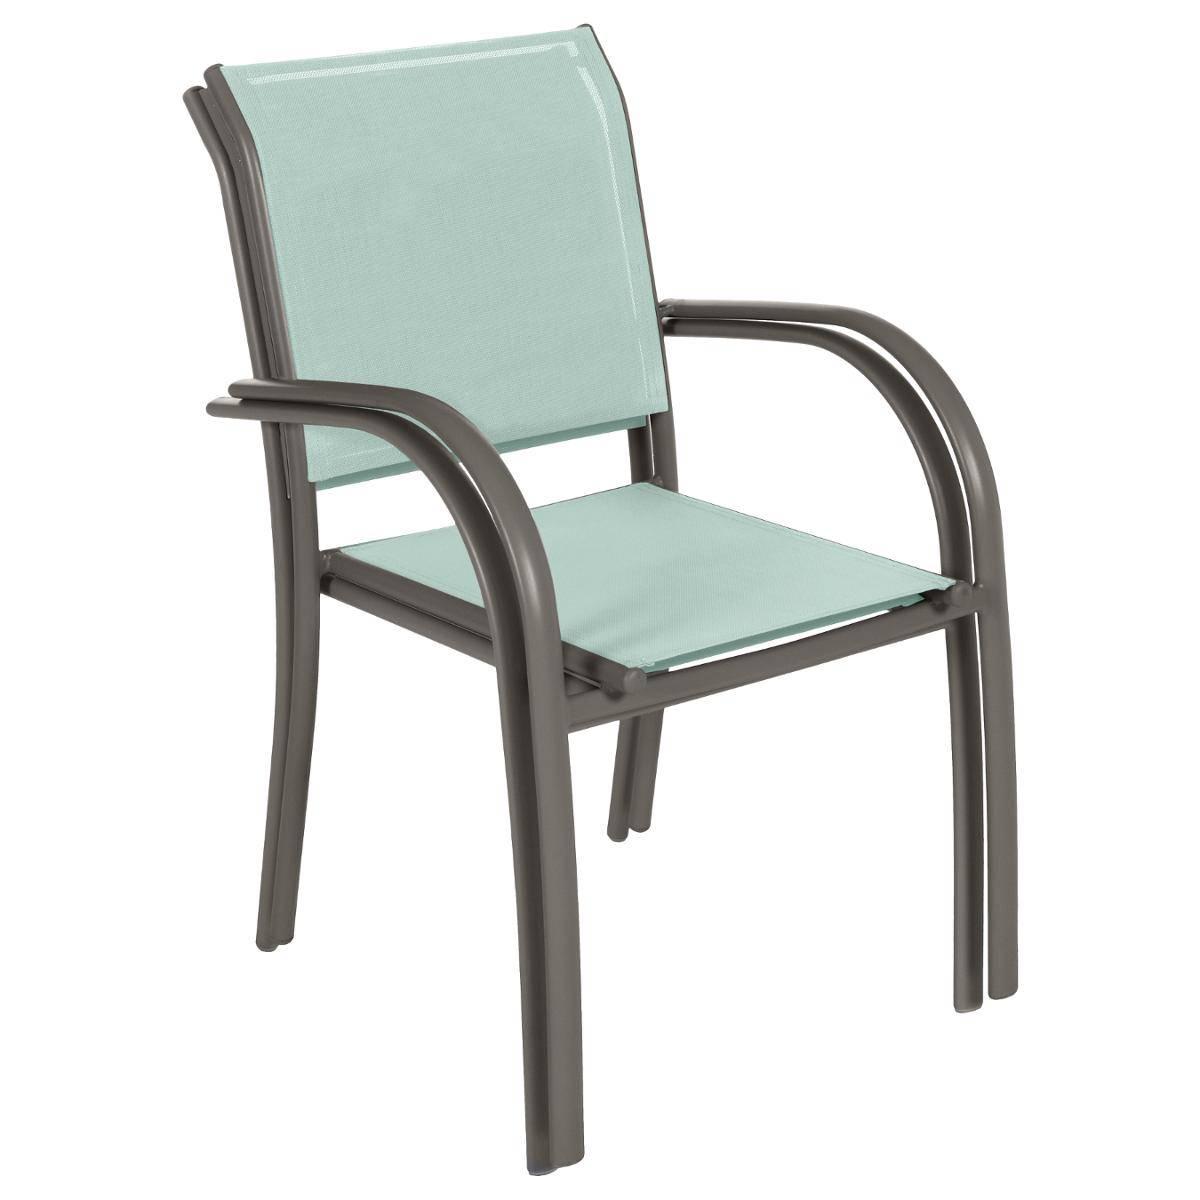 fauteuil de jardin empilable piazza vert celadon graphite hesperide com